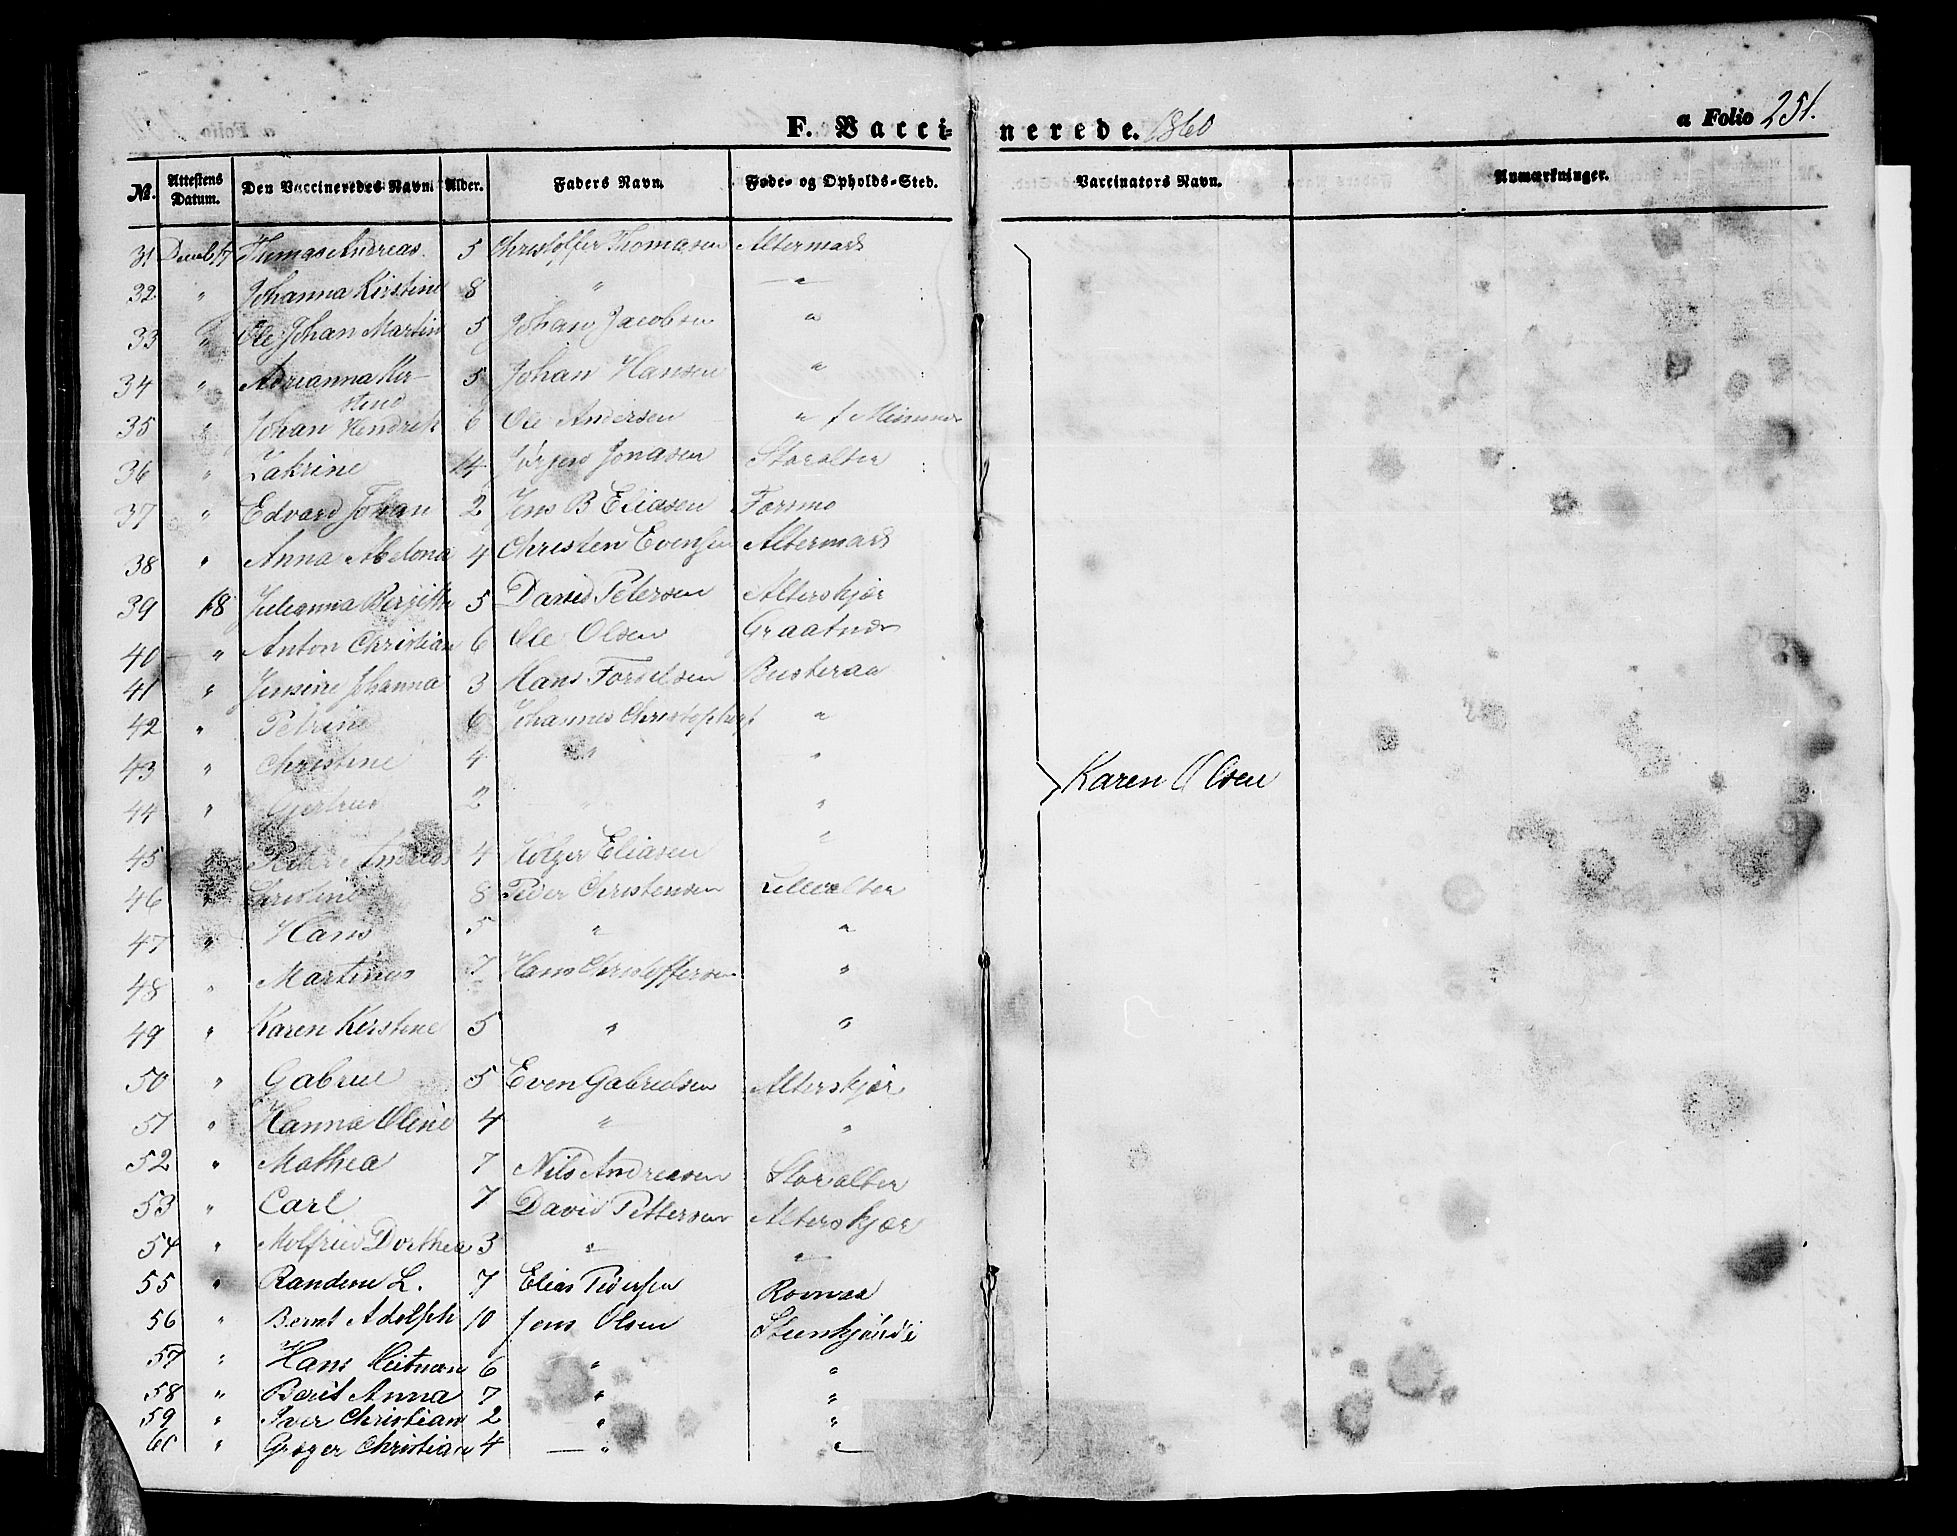 SAT, Ministerialprotokoller, klokkerbøker og fødselsregistre - Nordland, 827/L0414: Klokkerbok nr. 827C03, 1853-1865, s. 251